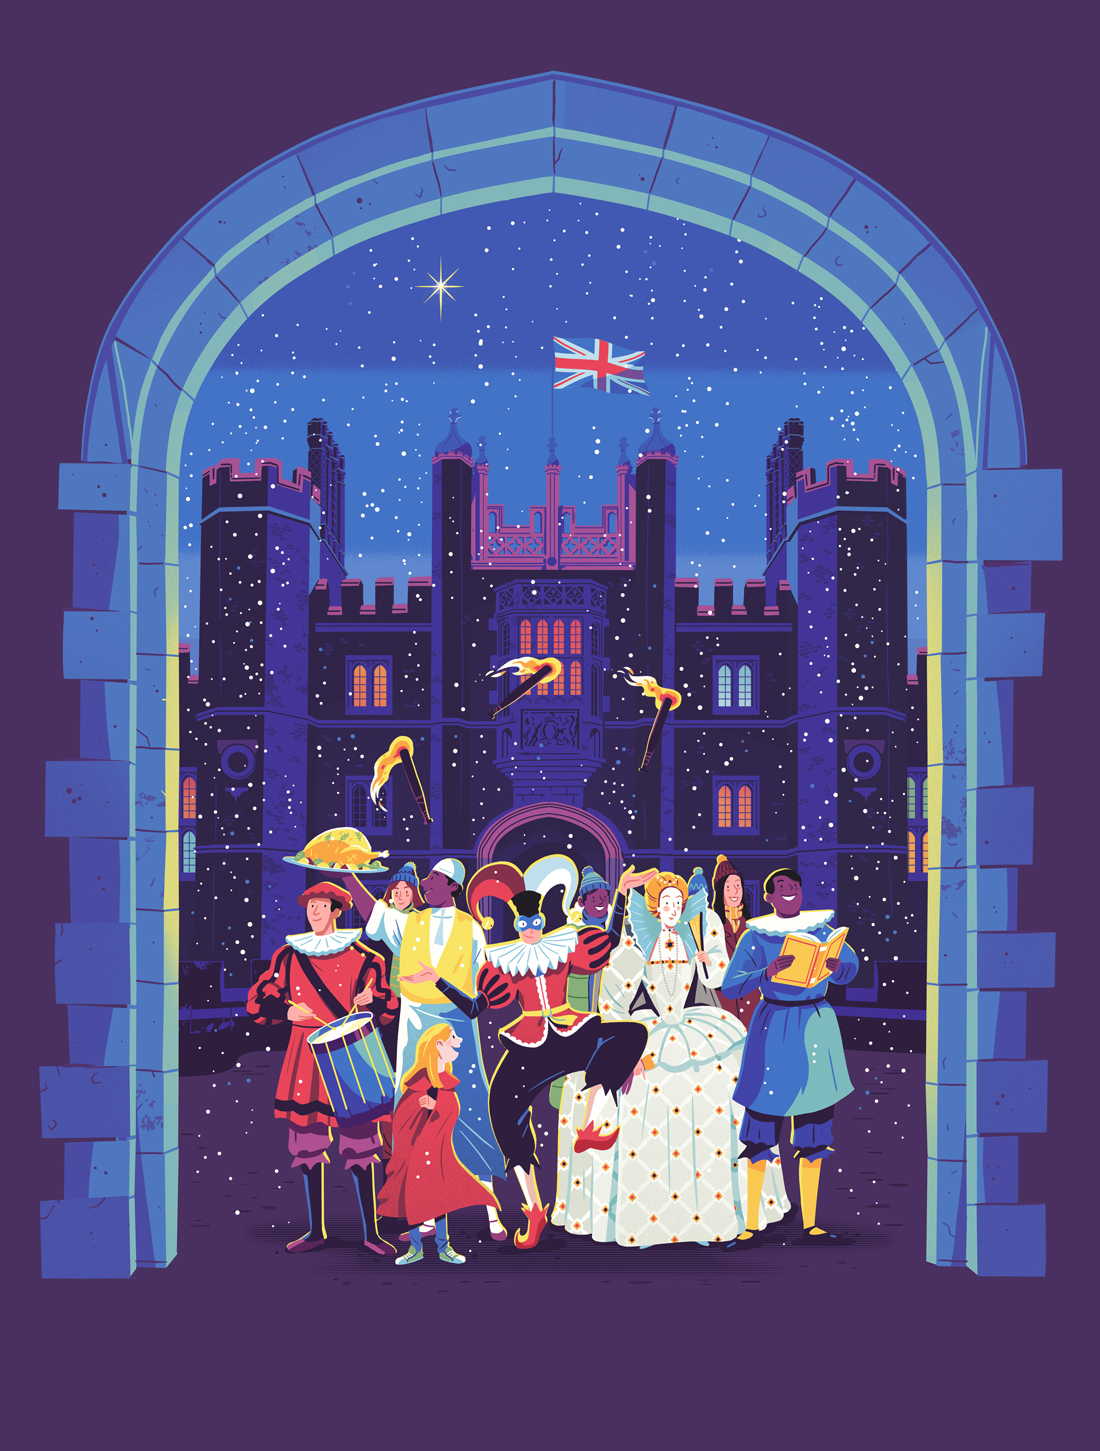 Historic Royal Palaces Poster Design Tower of London Kensington Palace